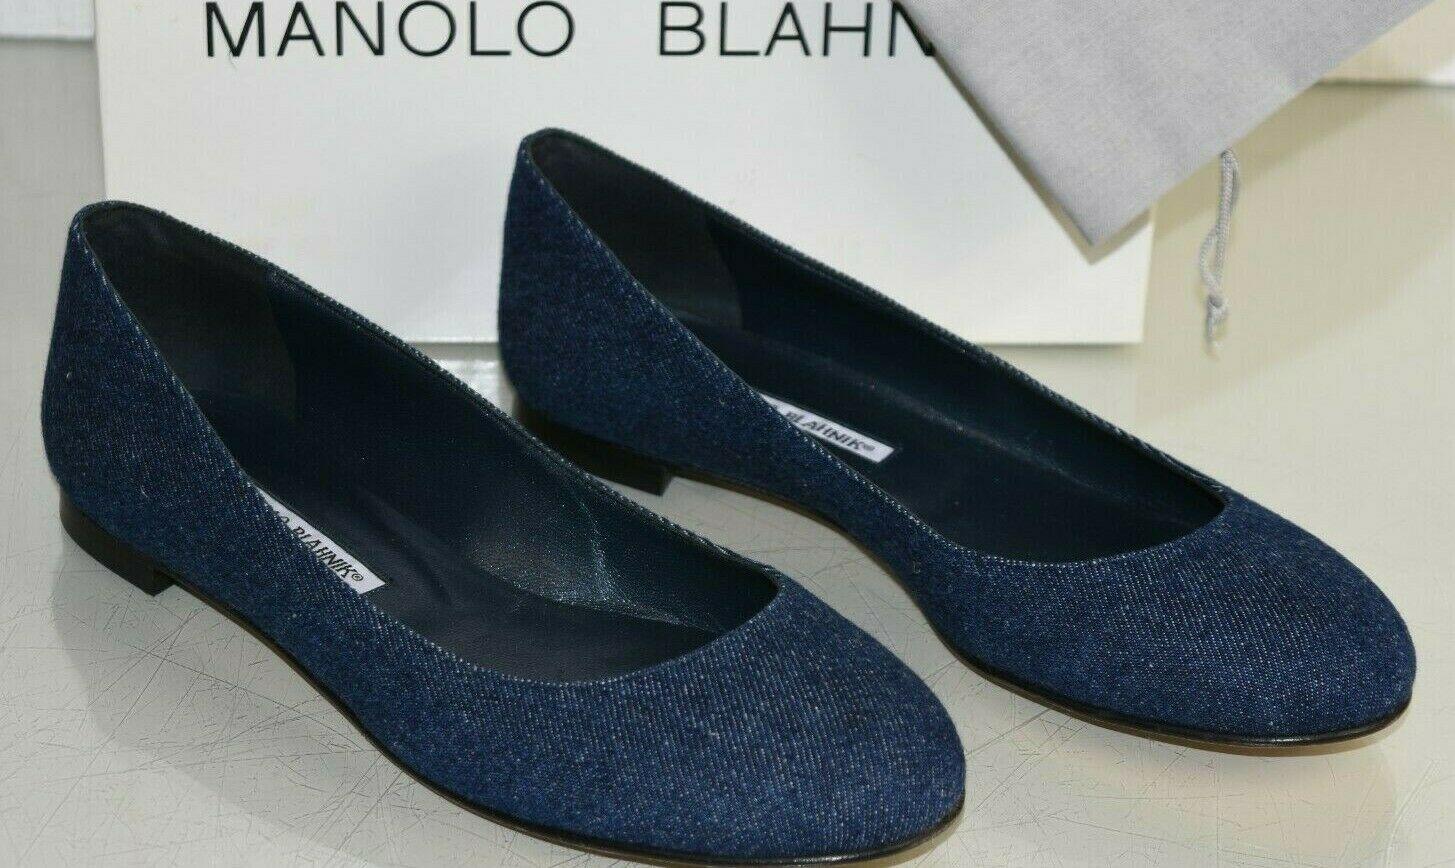 NEW Manolo Blahnik TERE Jeans Flats Blue DENIM Navy Round Toe Shoes 38.5 40.5 41